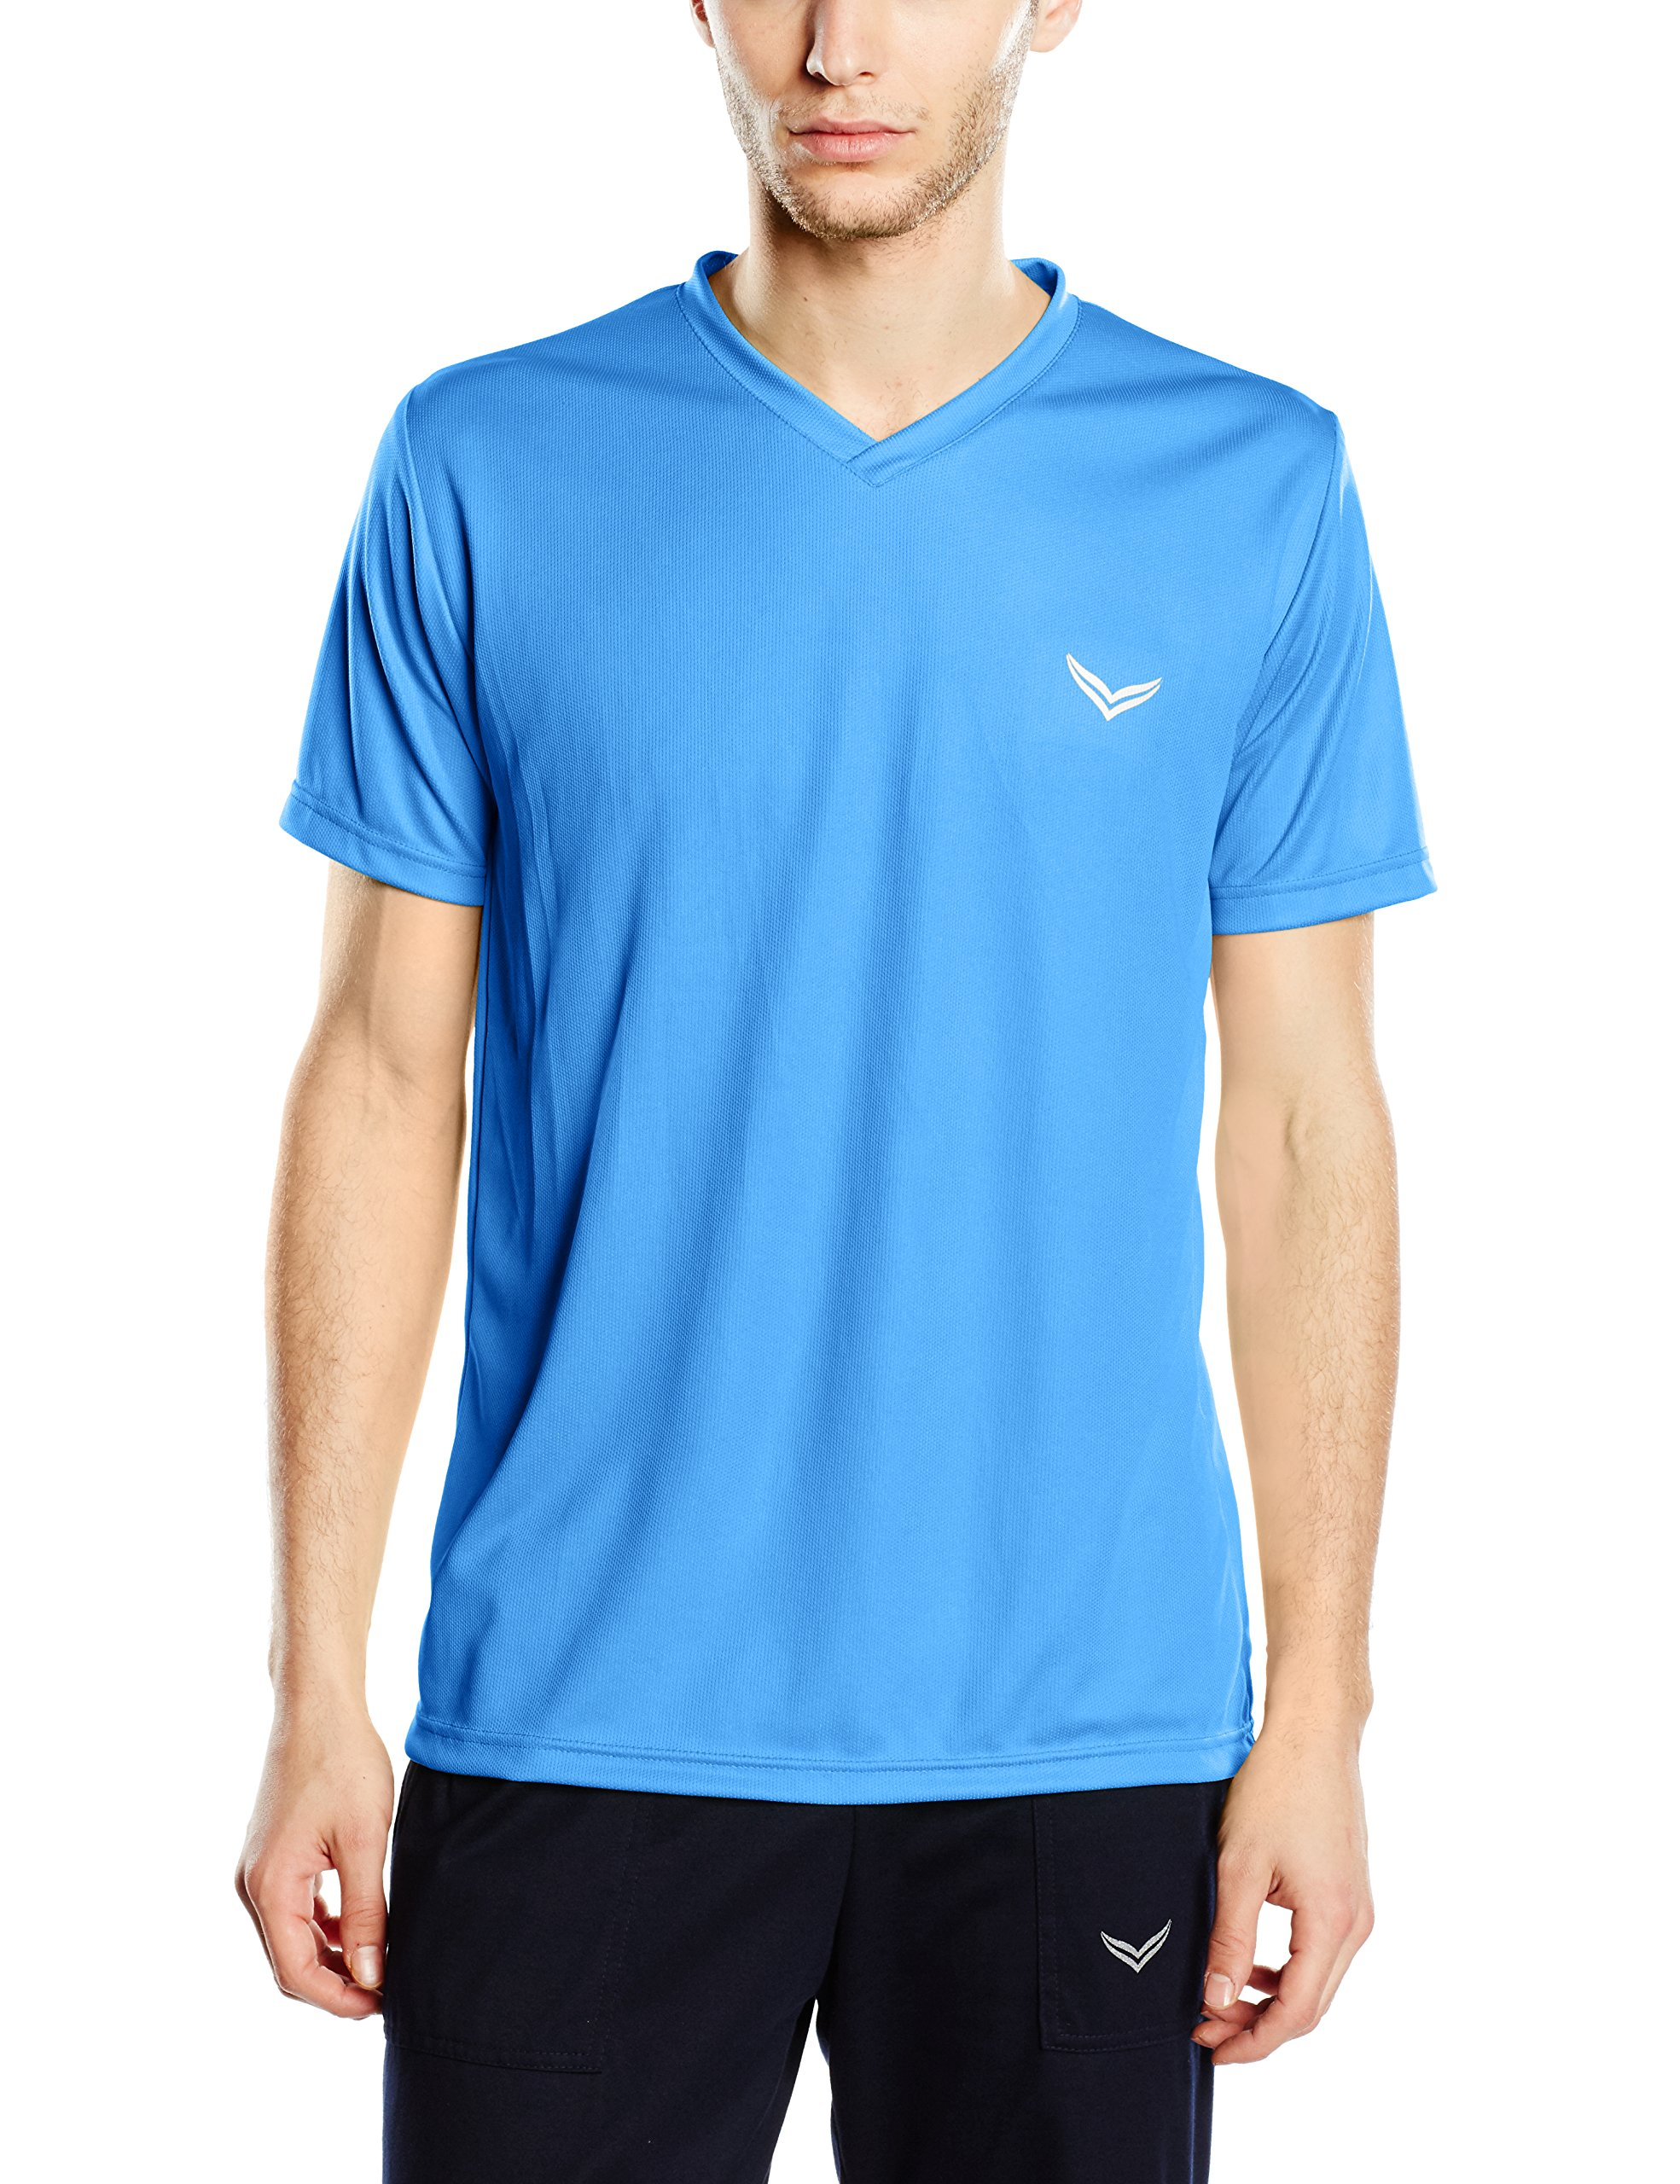 Trigema Herren 048X shirt V Blue CoolmaxBleuBlauelectric Homme large UMpGLSqVz